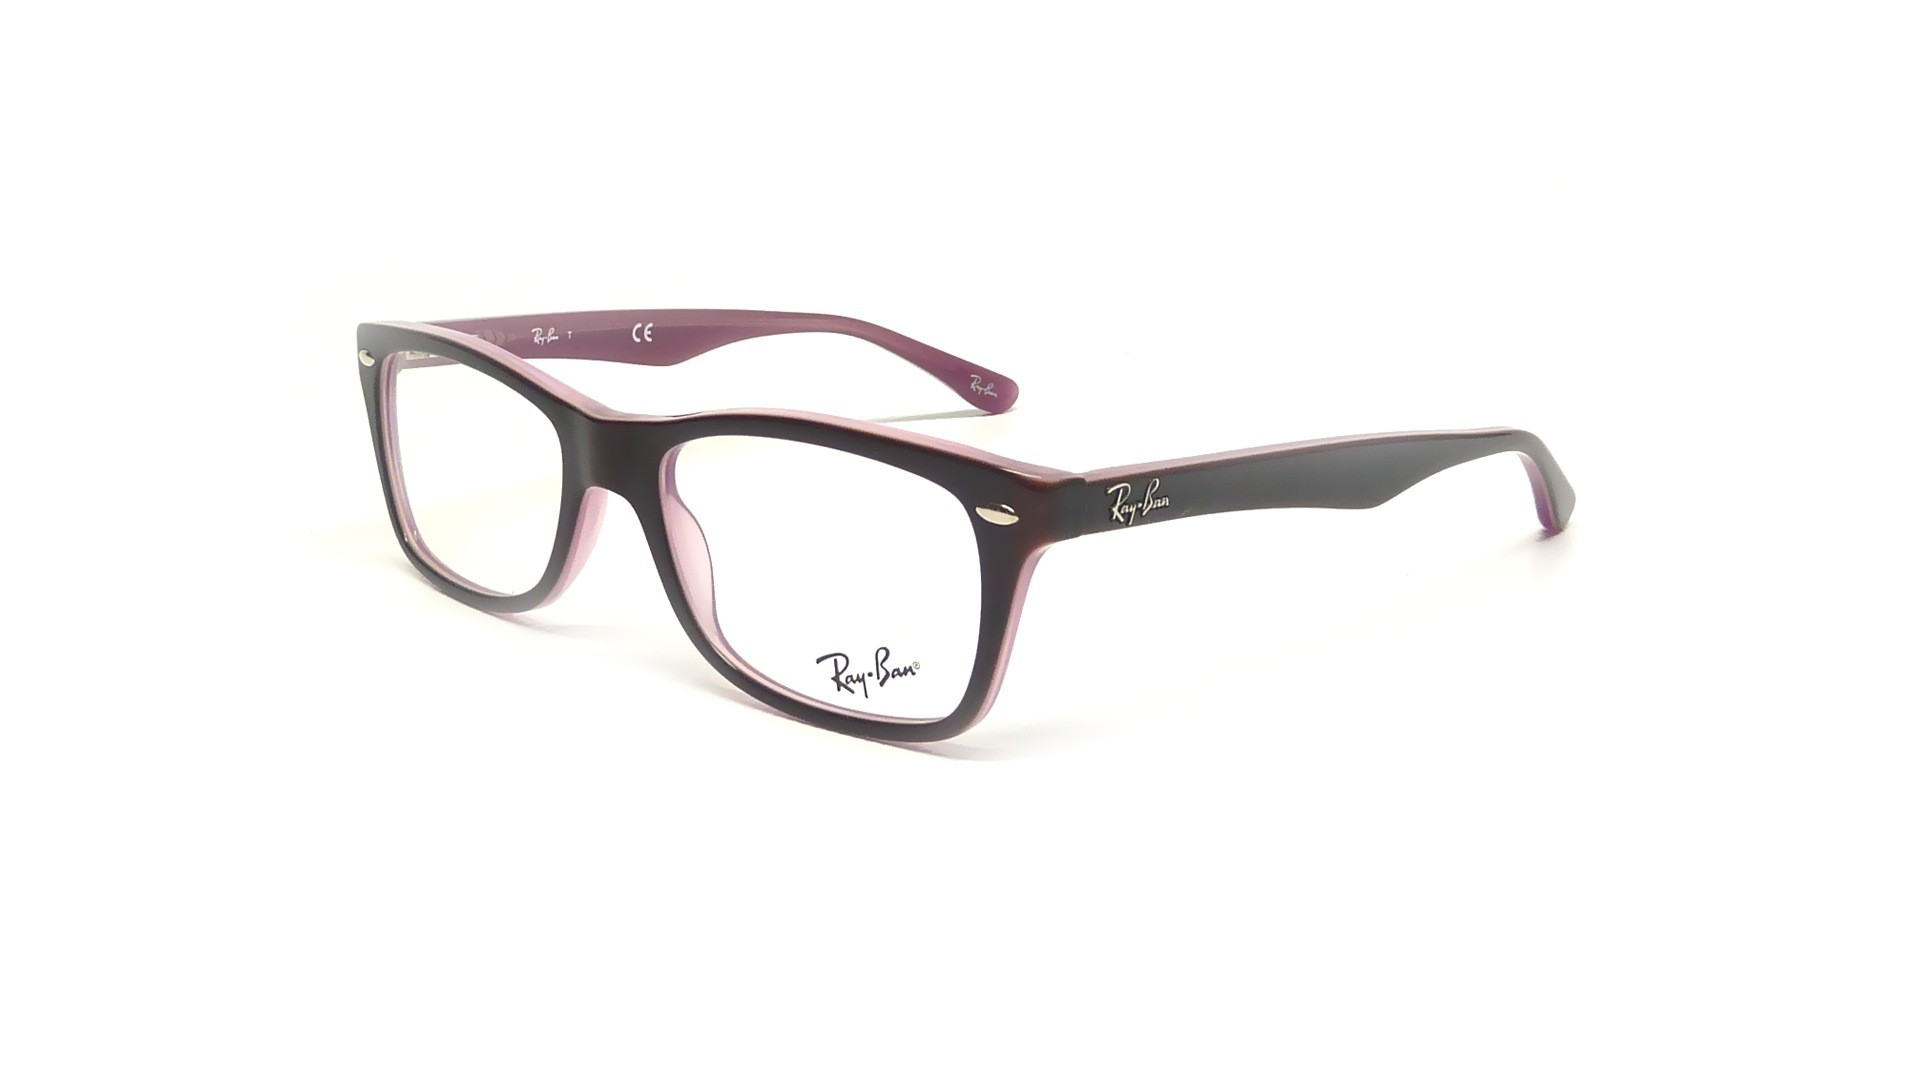 rayban sunglass frames  Ray-Ban RB 5228 Eyeglasses \u0026 Frames